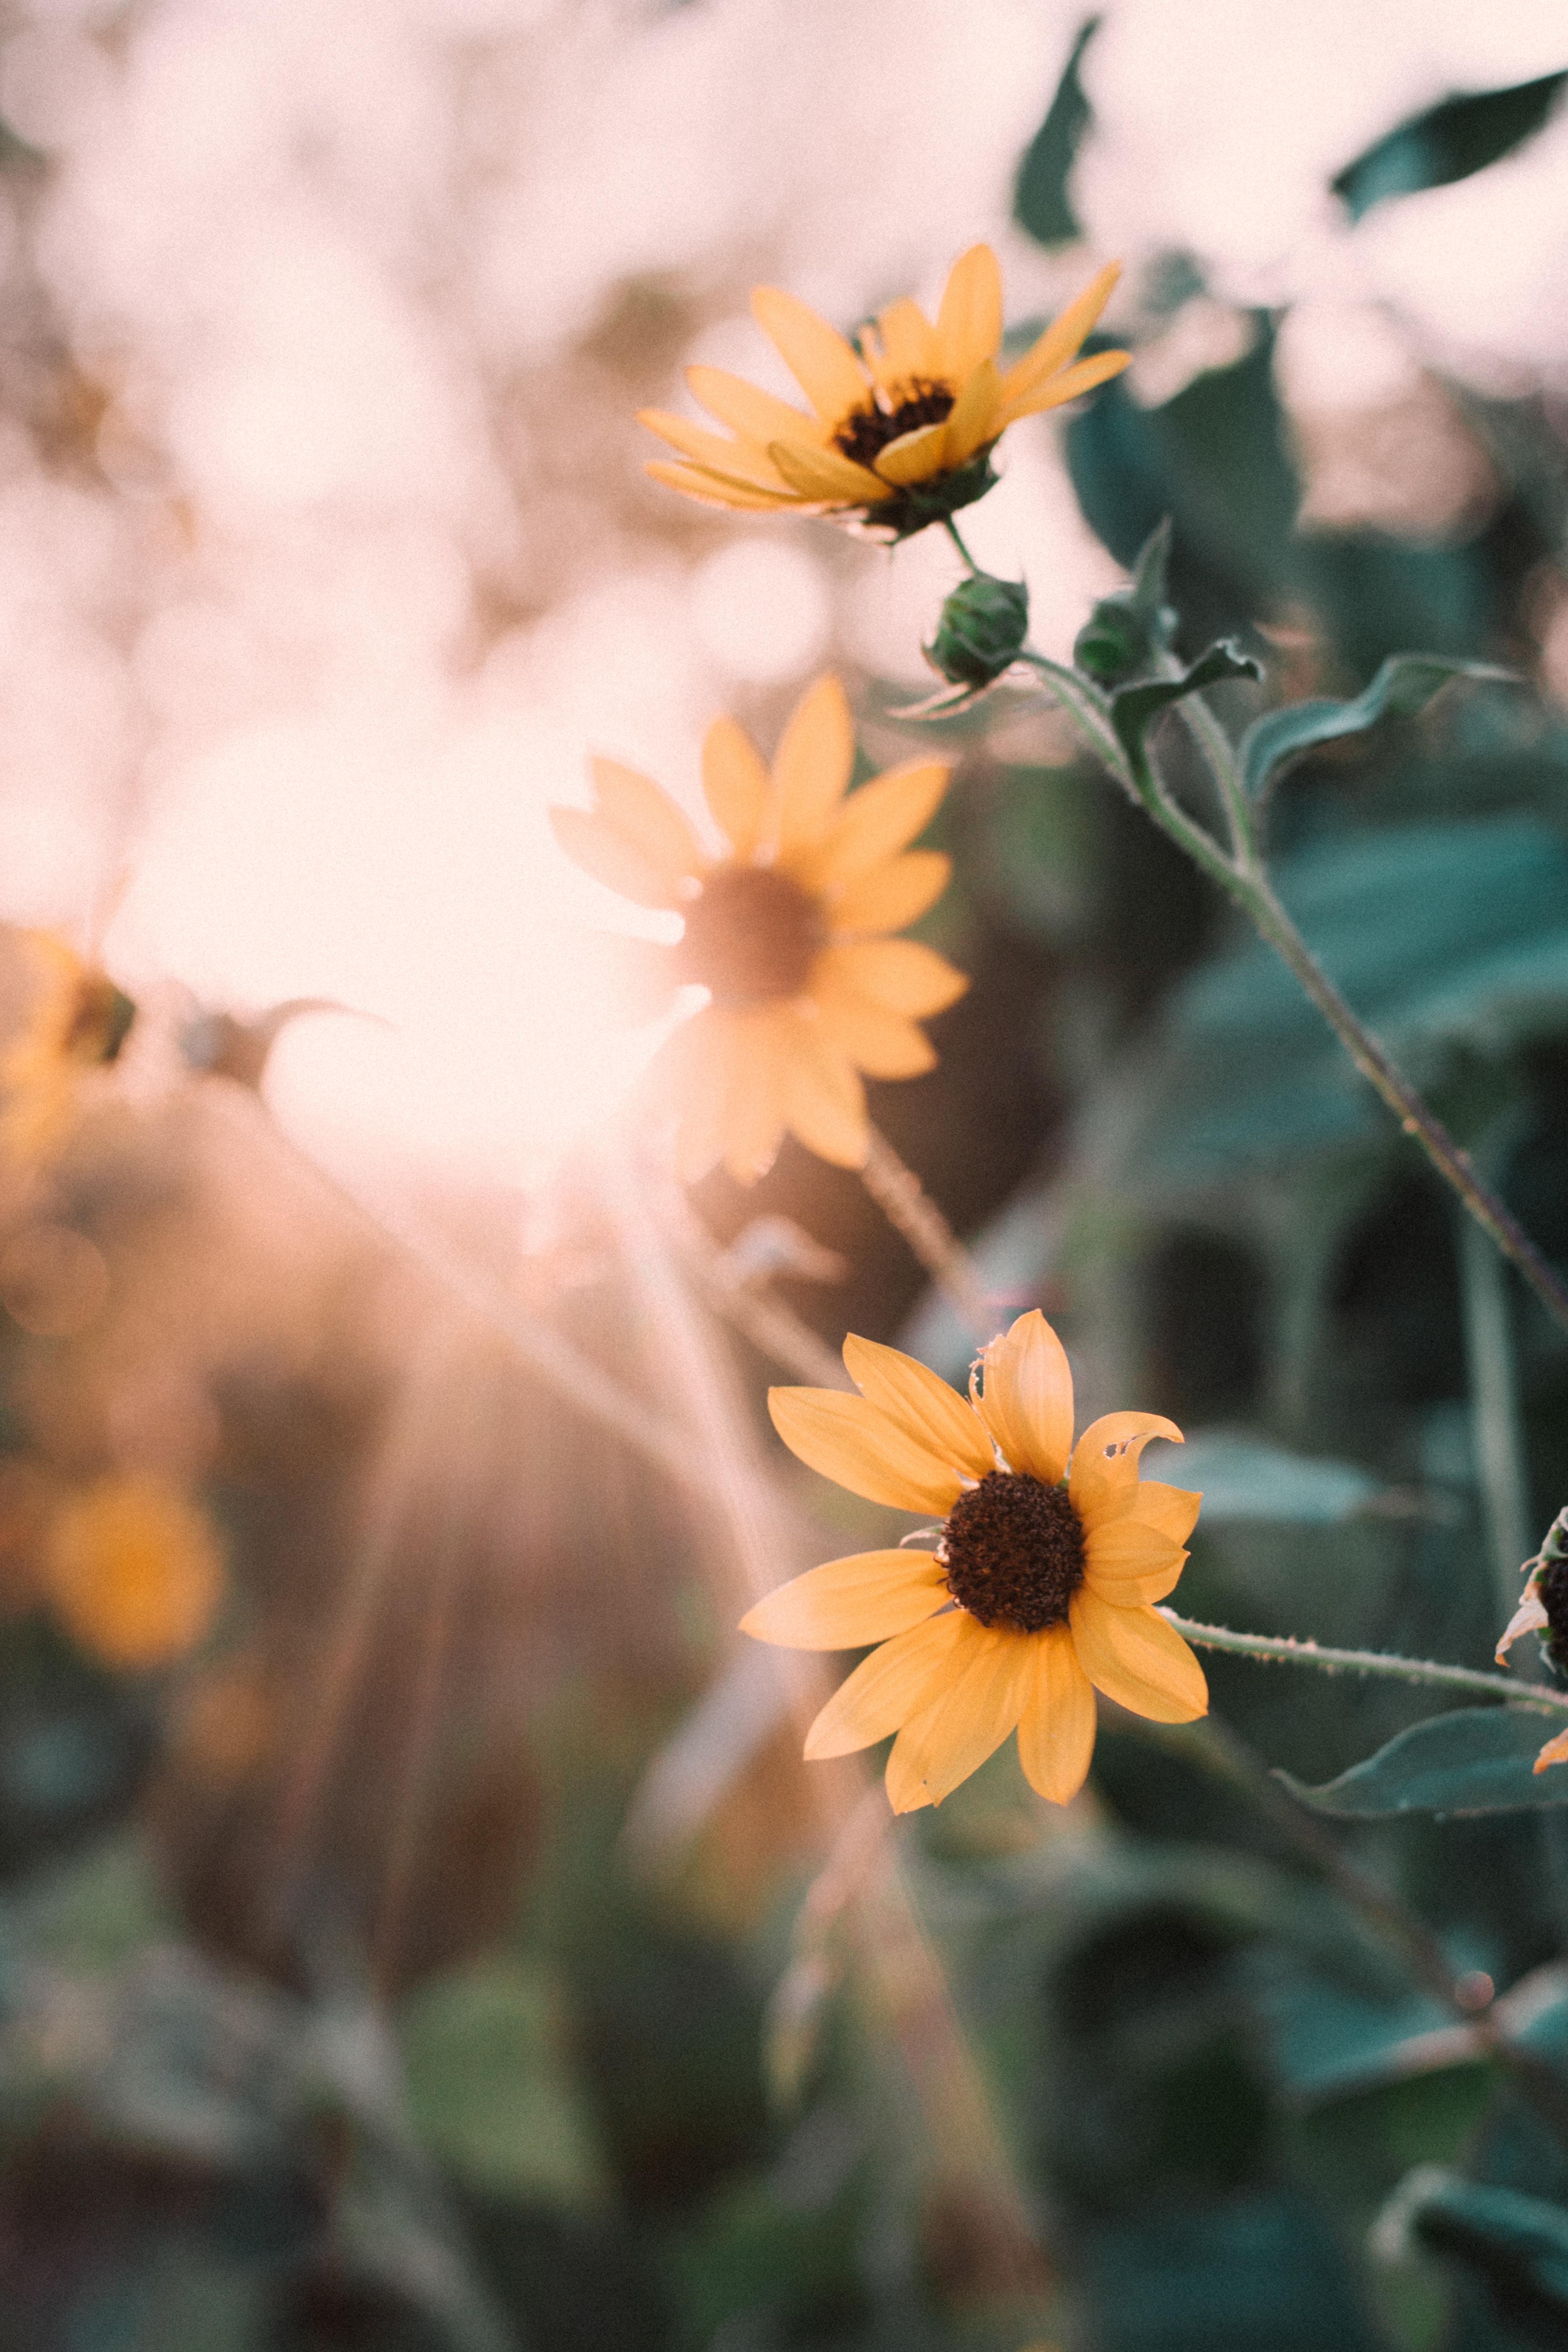 sun rays through yellow flowers during daytime